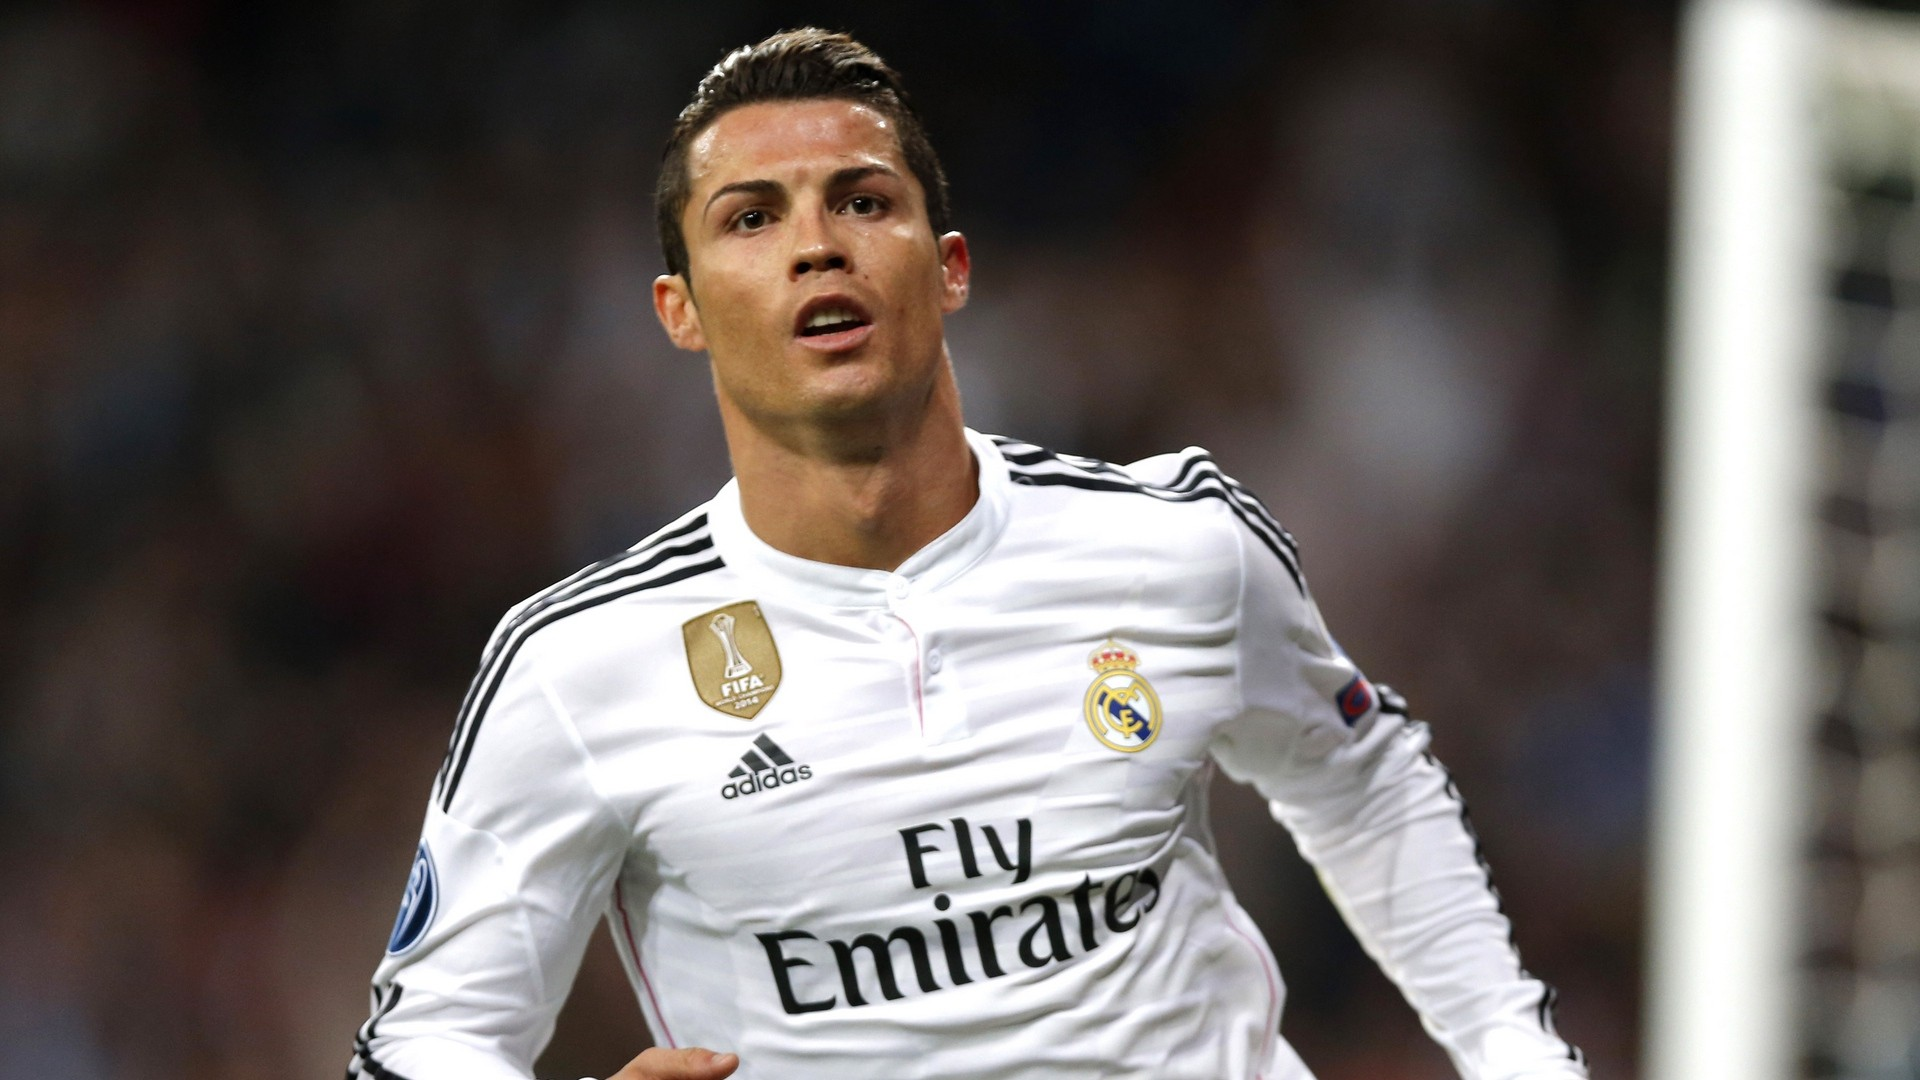 Cristiano Ronaldo Forever Hd Wallpaper Iphone 7 Plus